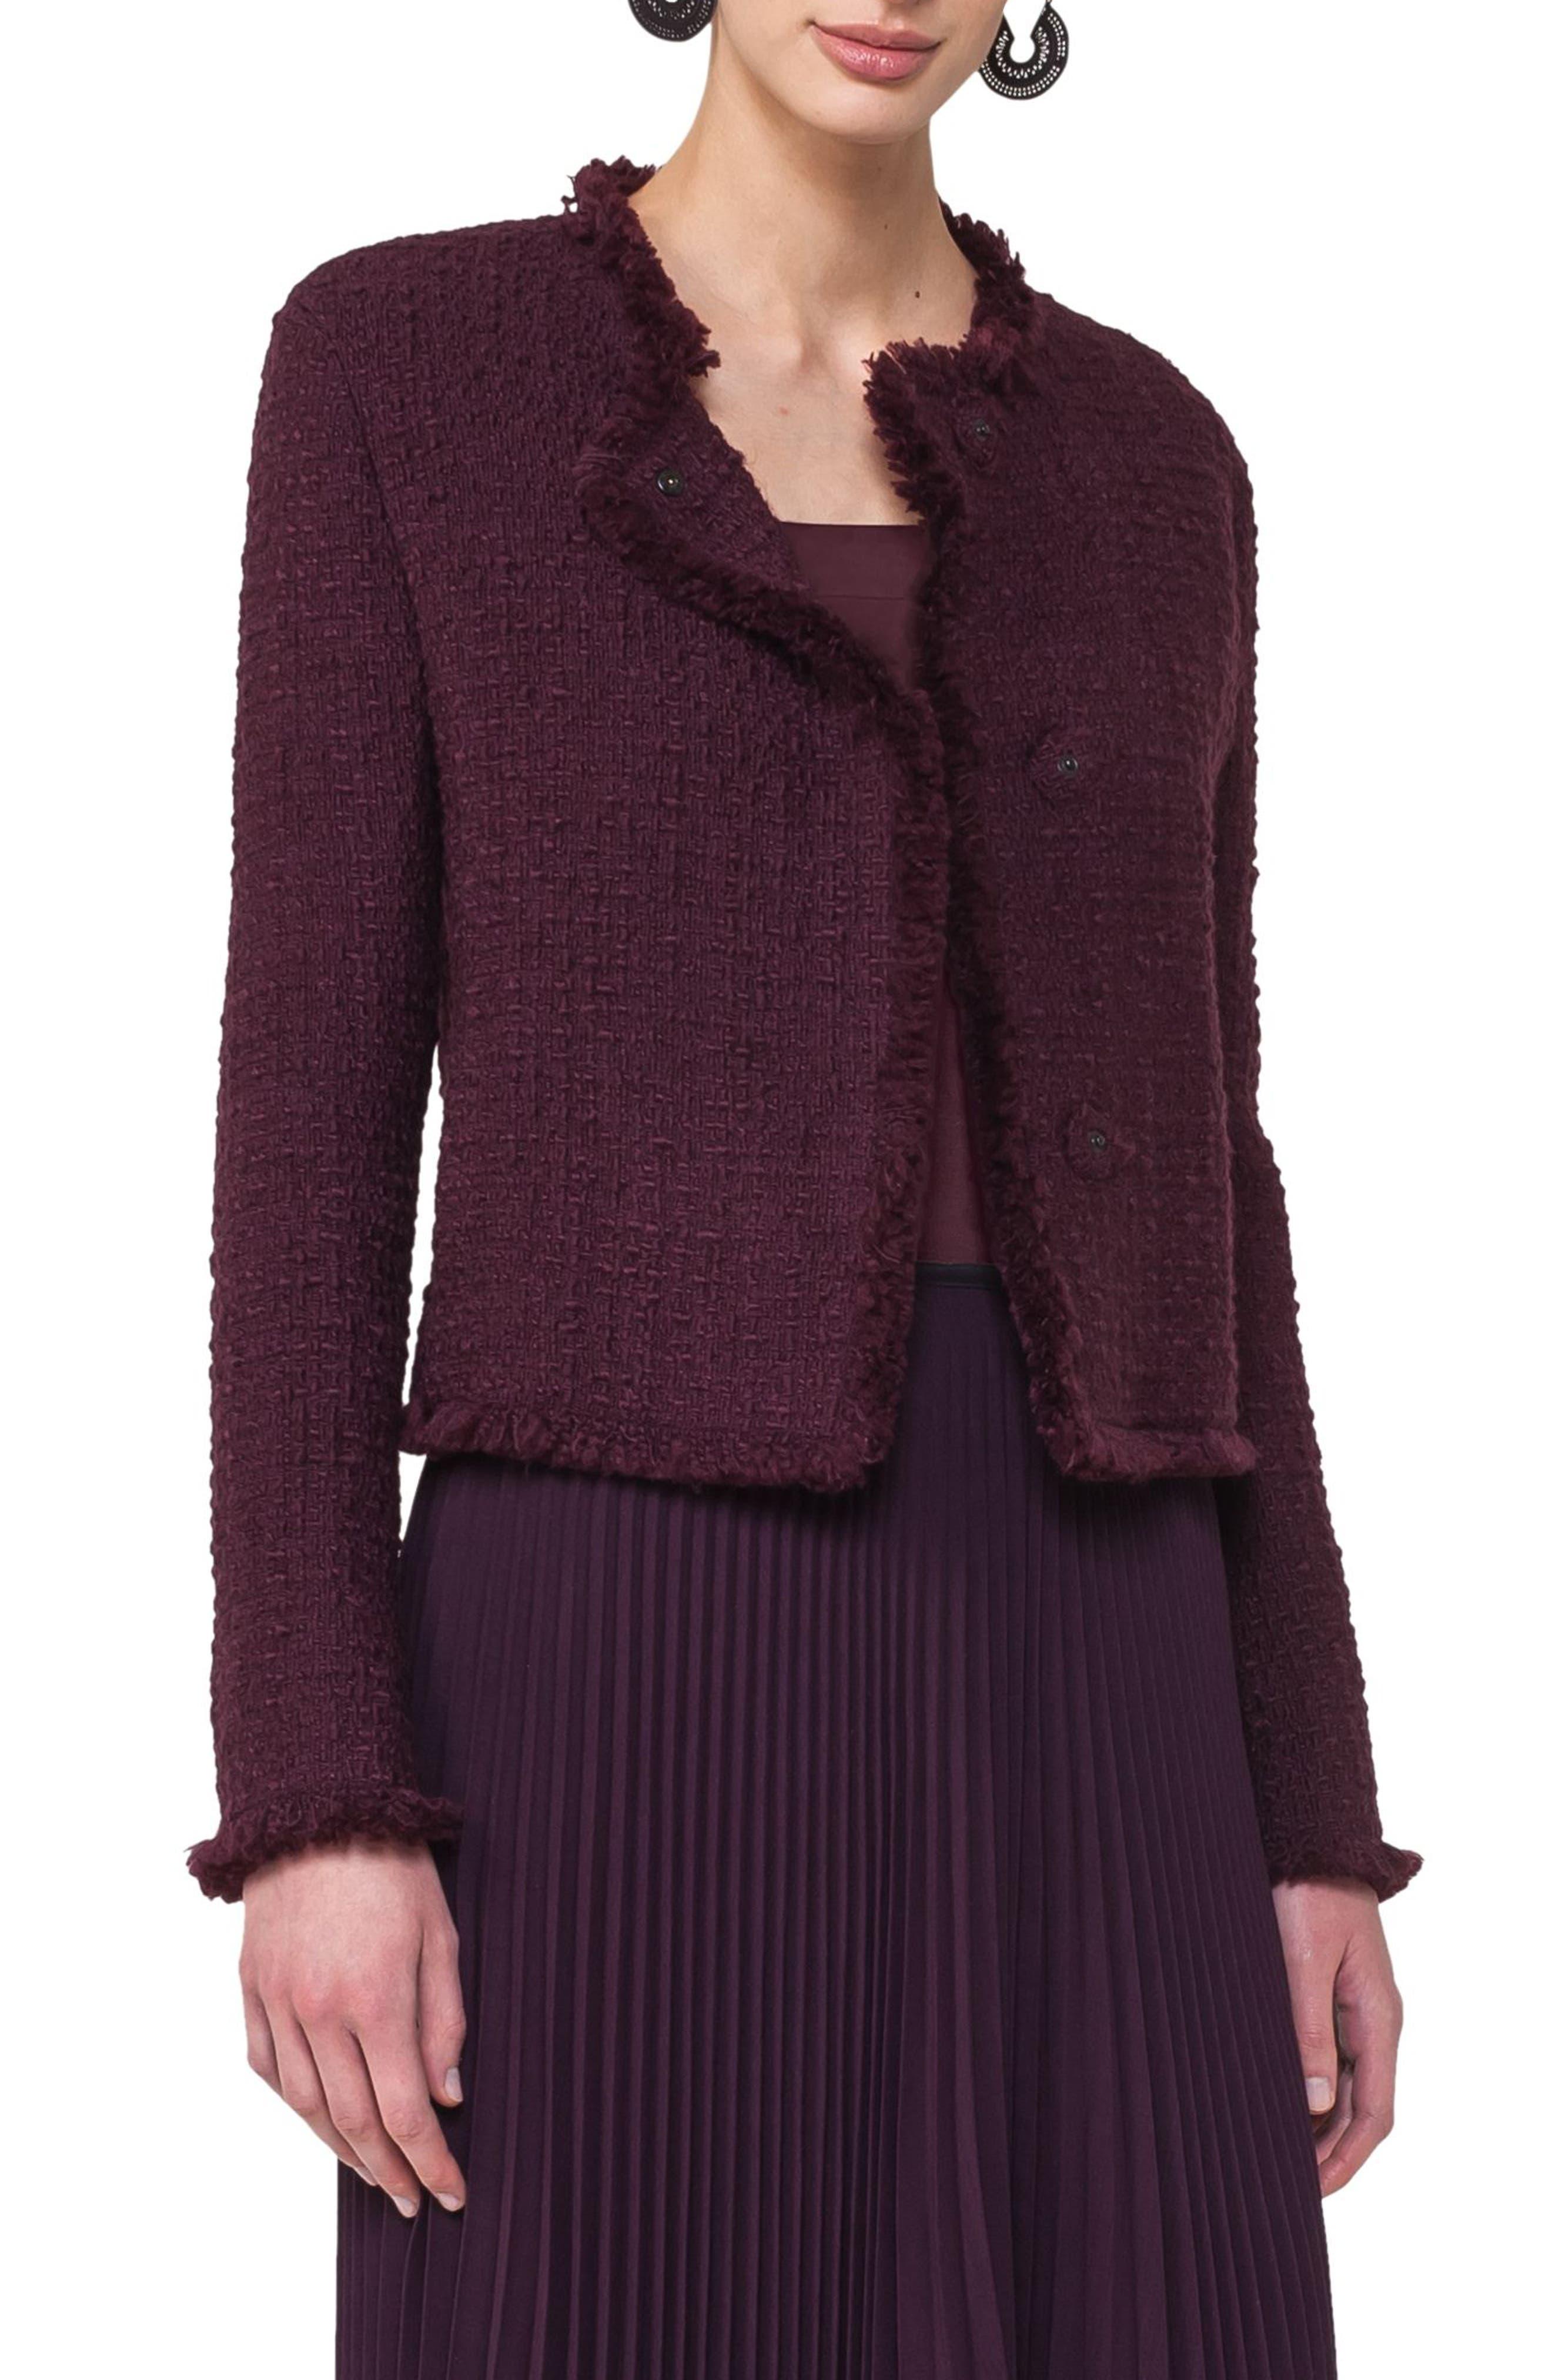 Tweed Jacket,                             Main thumbnail 1, color,                             Wine